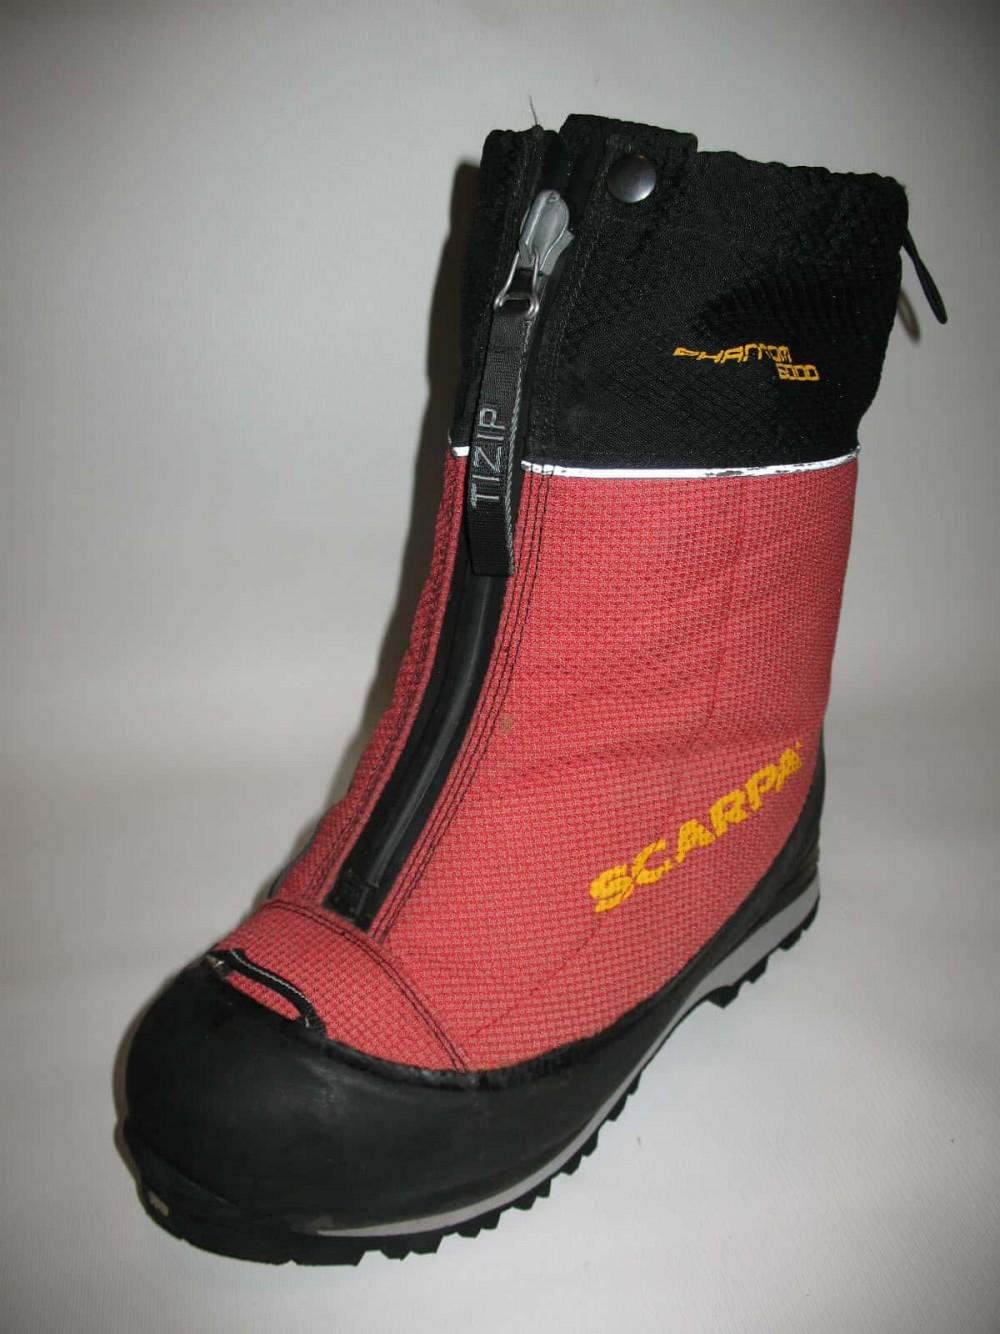 Ботинки SCARPA phantom 6000 boots (размер EU45(на стопу +-280mm)) - 2